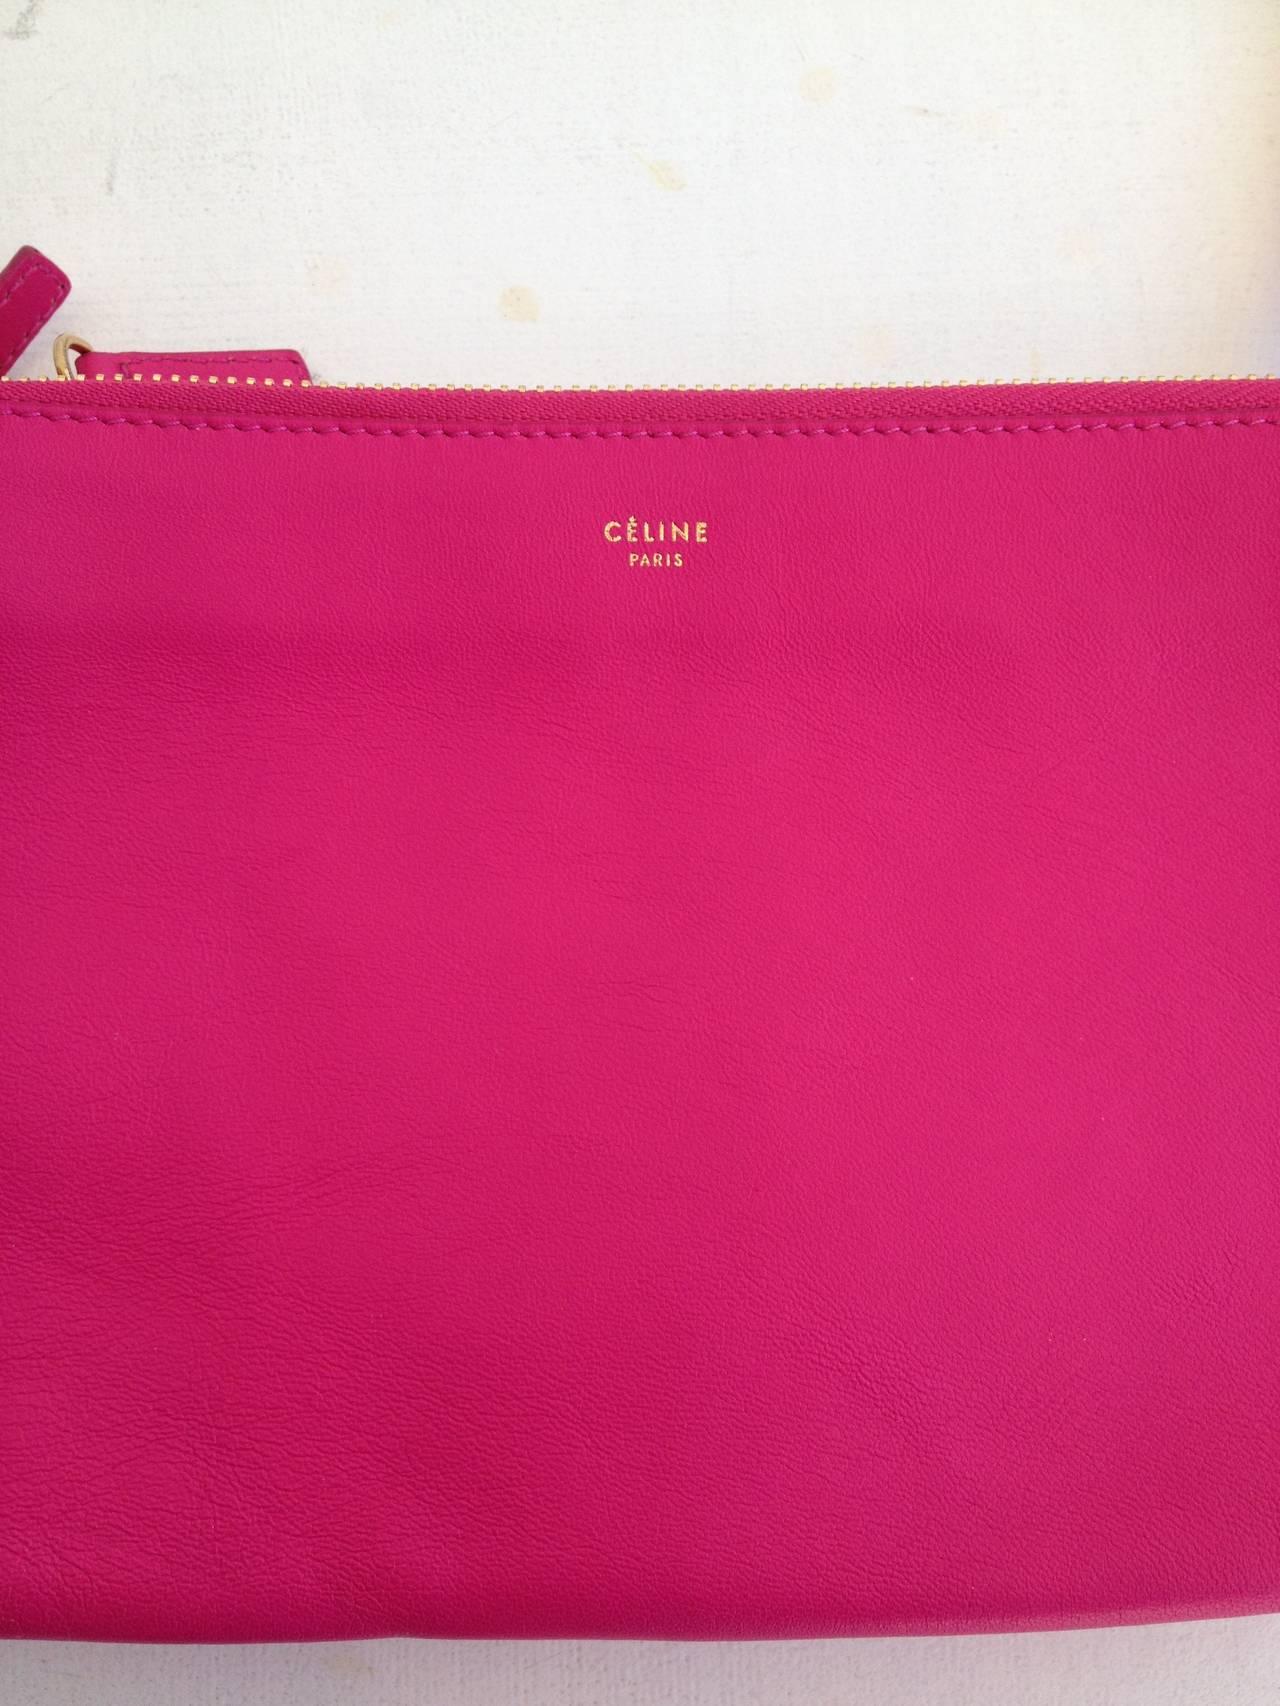 Celine Hot Pink Trio Clutch at 1stdibs